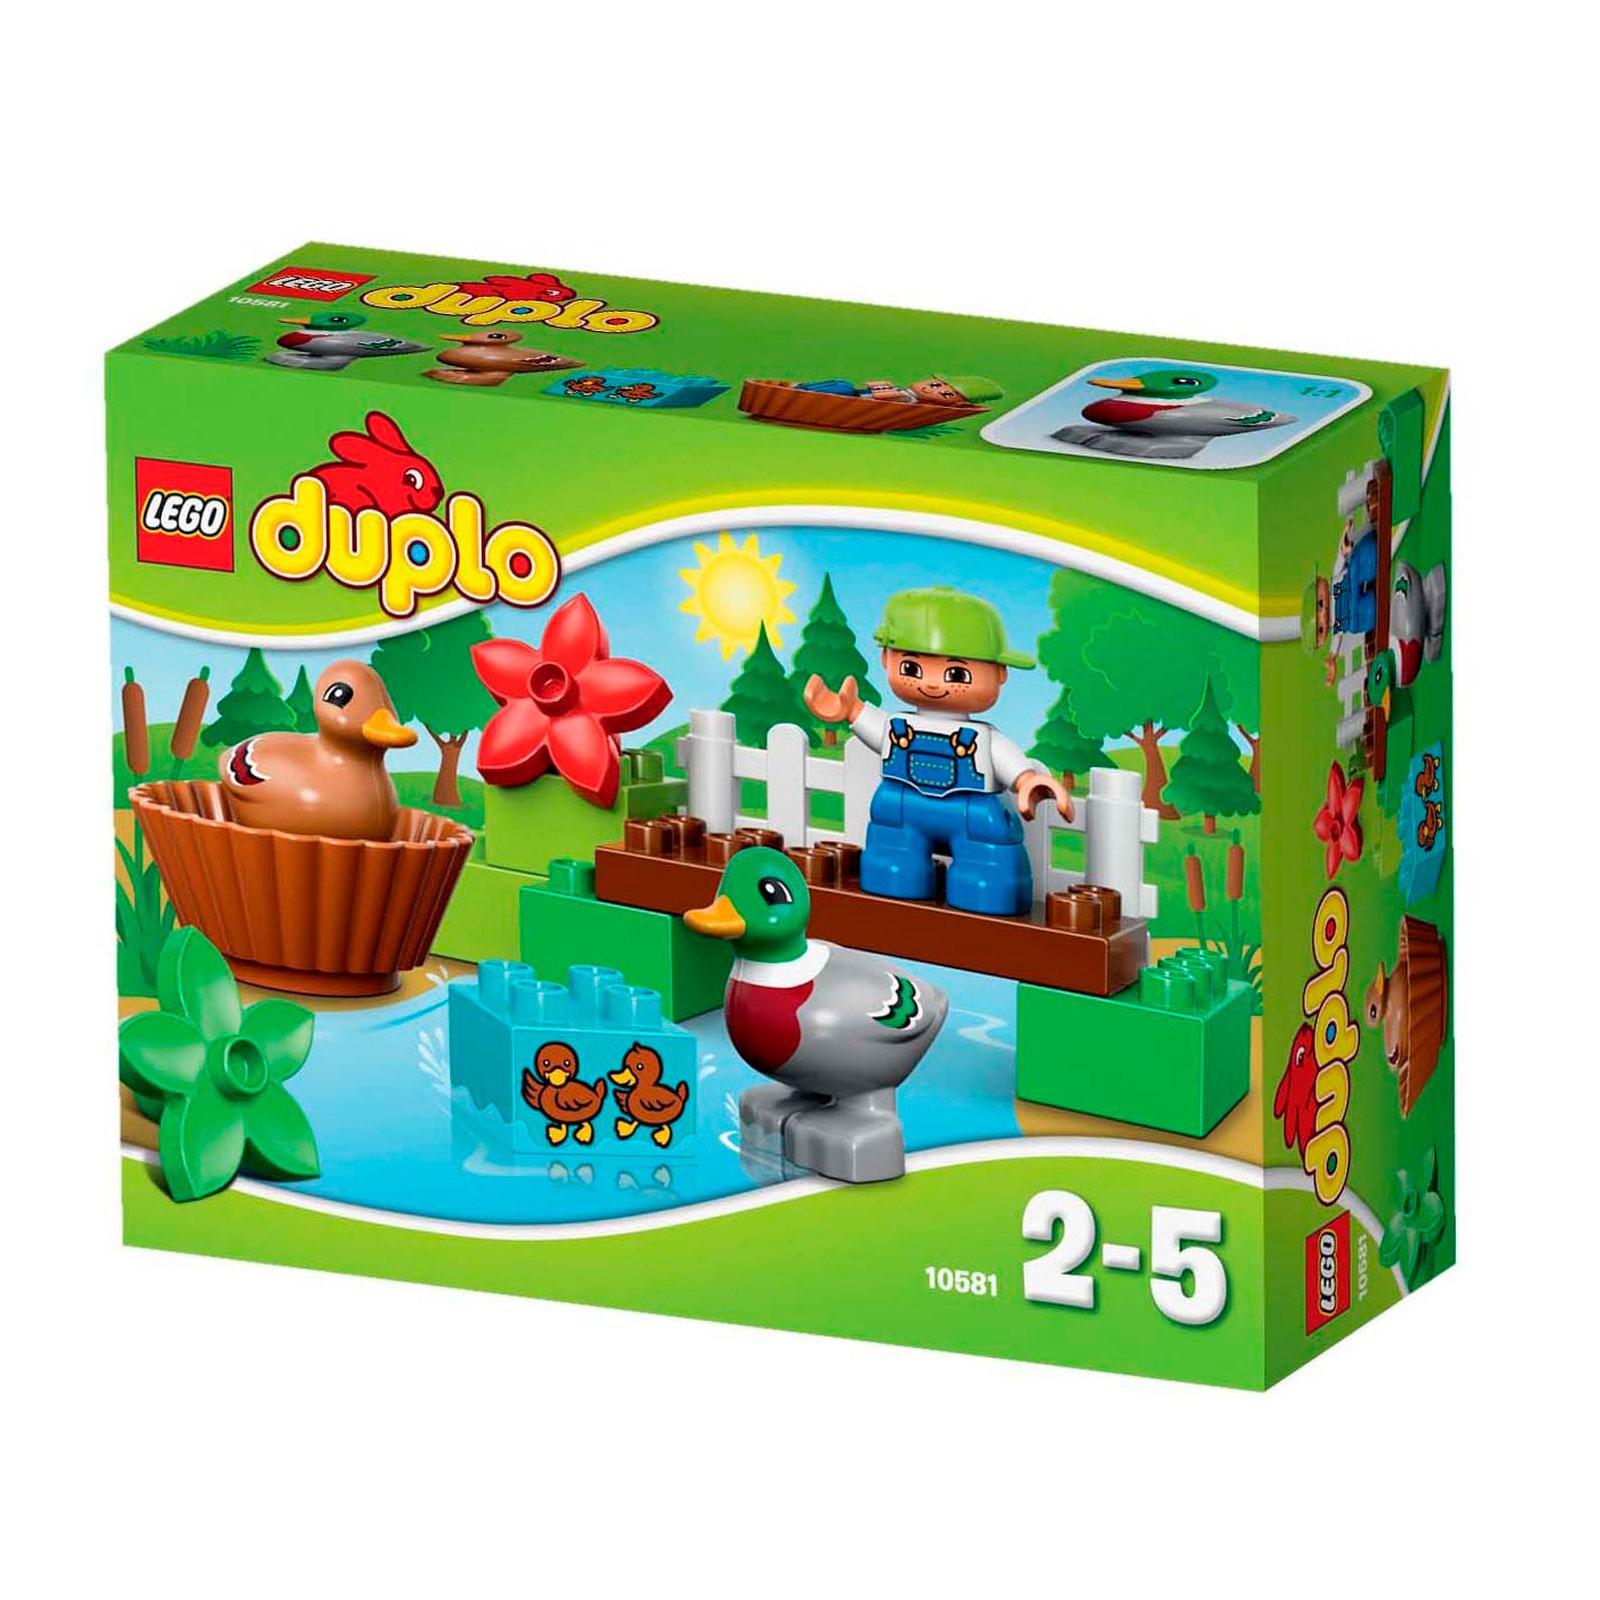 ����������� LEGO Duplo 10581 ������ � ����